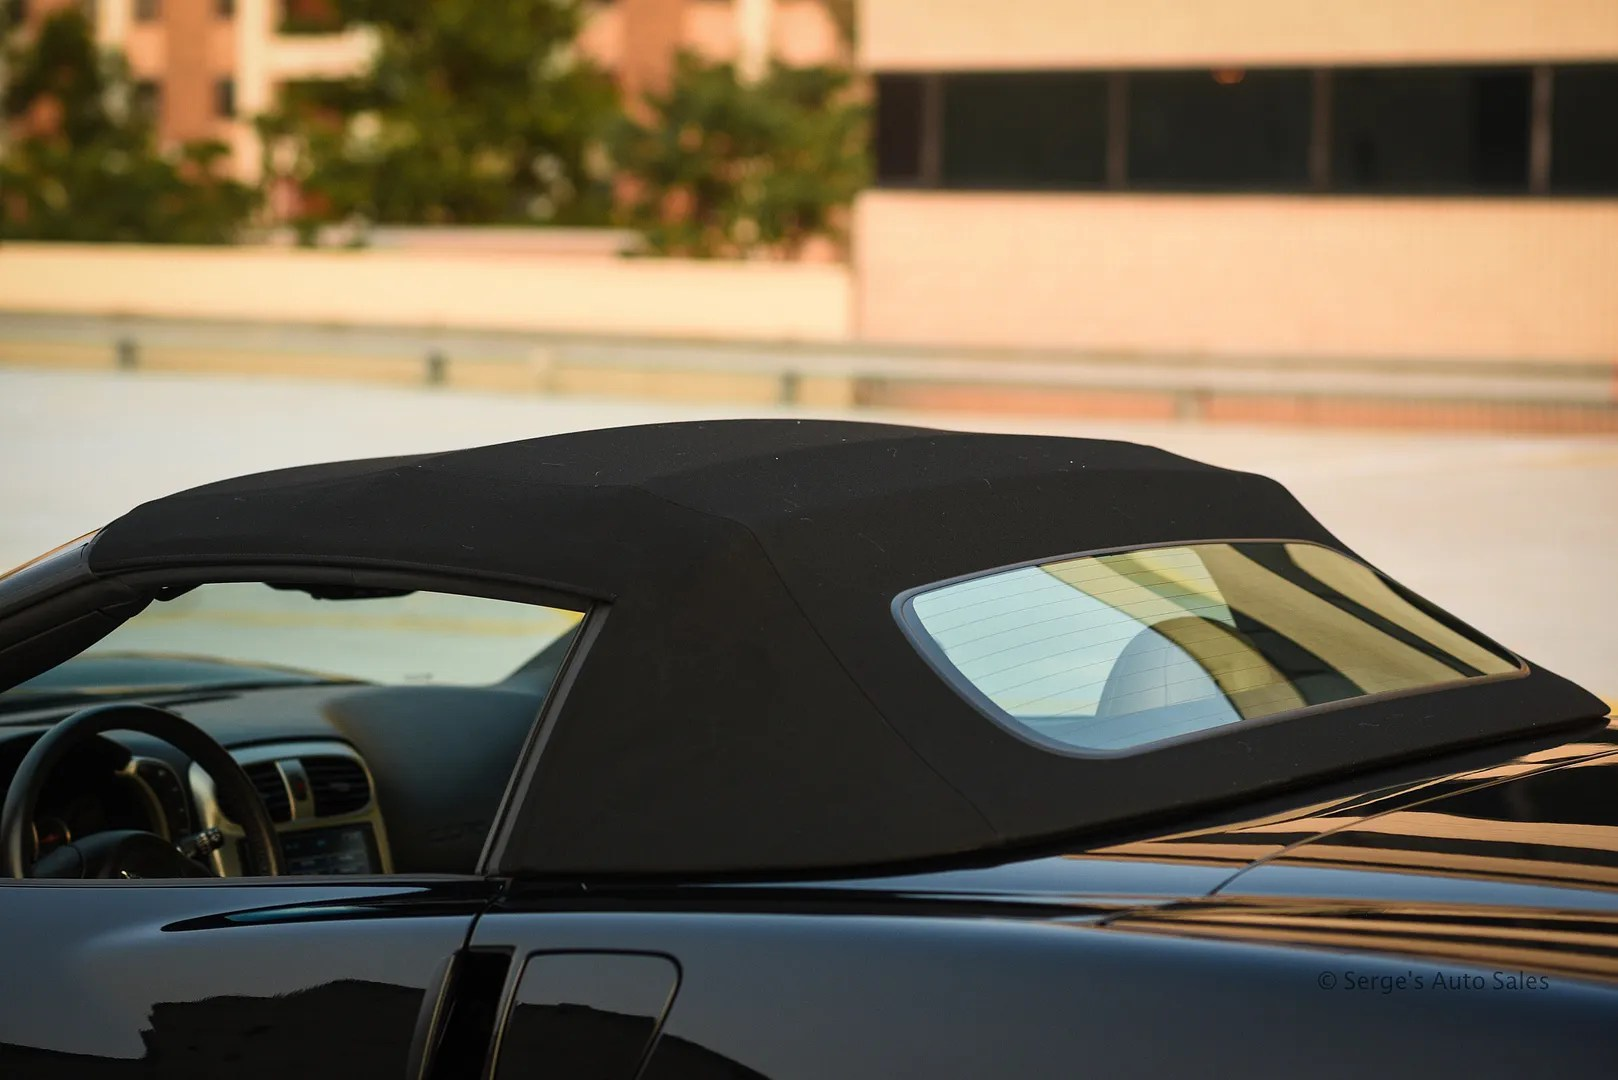 photo 2005-C6-Corvette-Convertible-For-Sale-Scranton-Serges-Auto-Sales-dealer--17_zpsocjnngi7.jpg